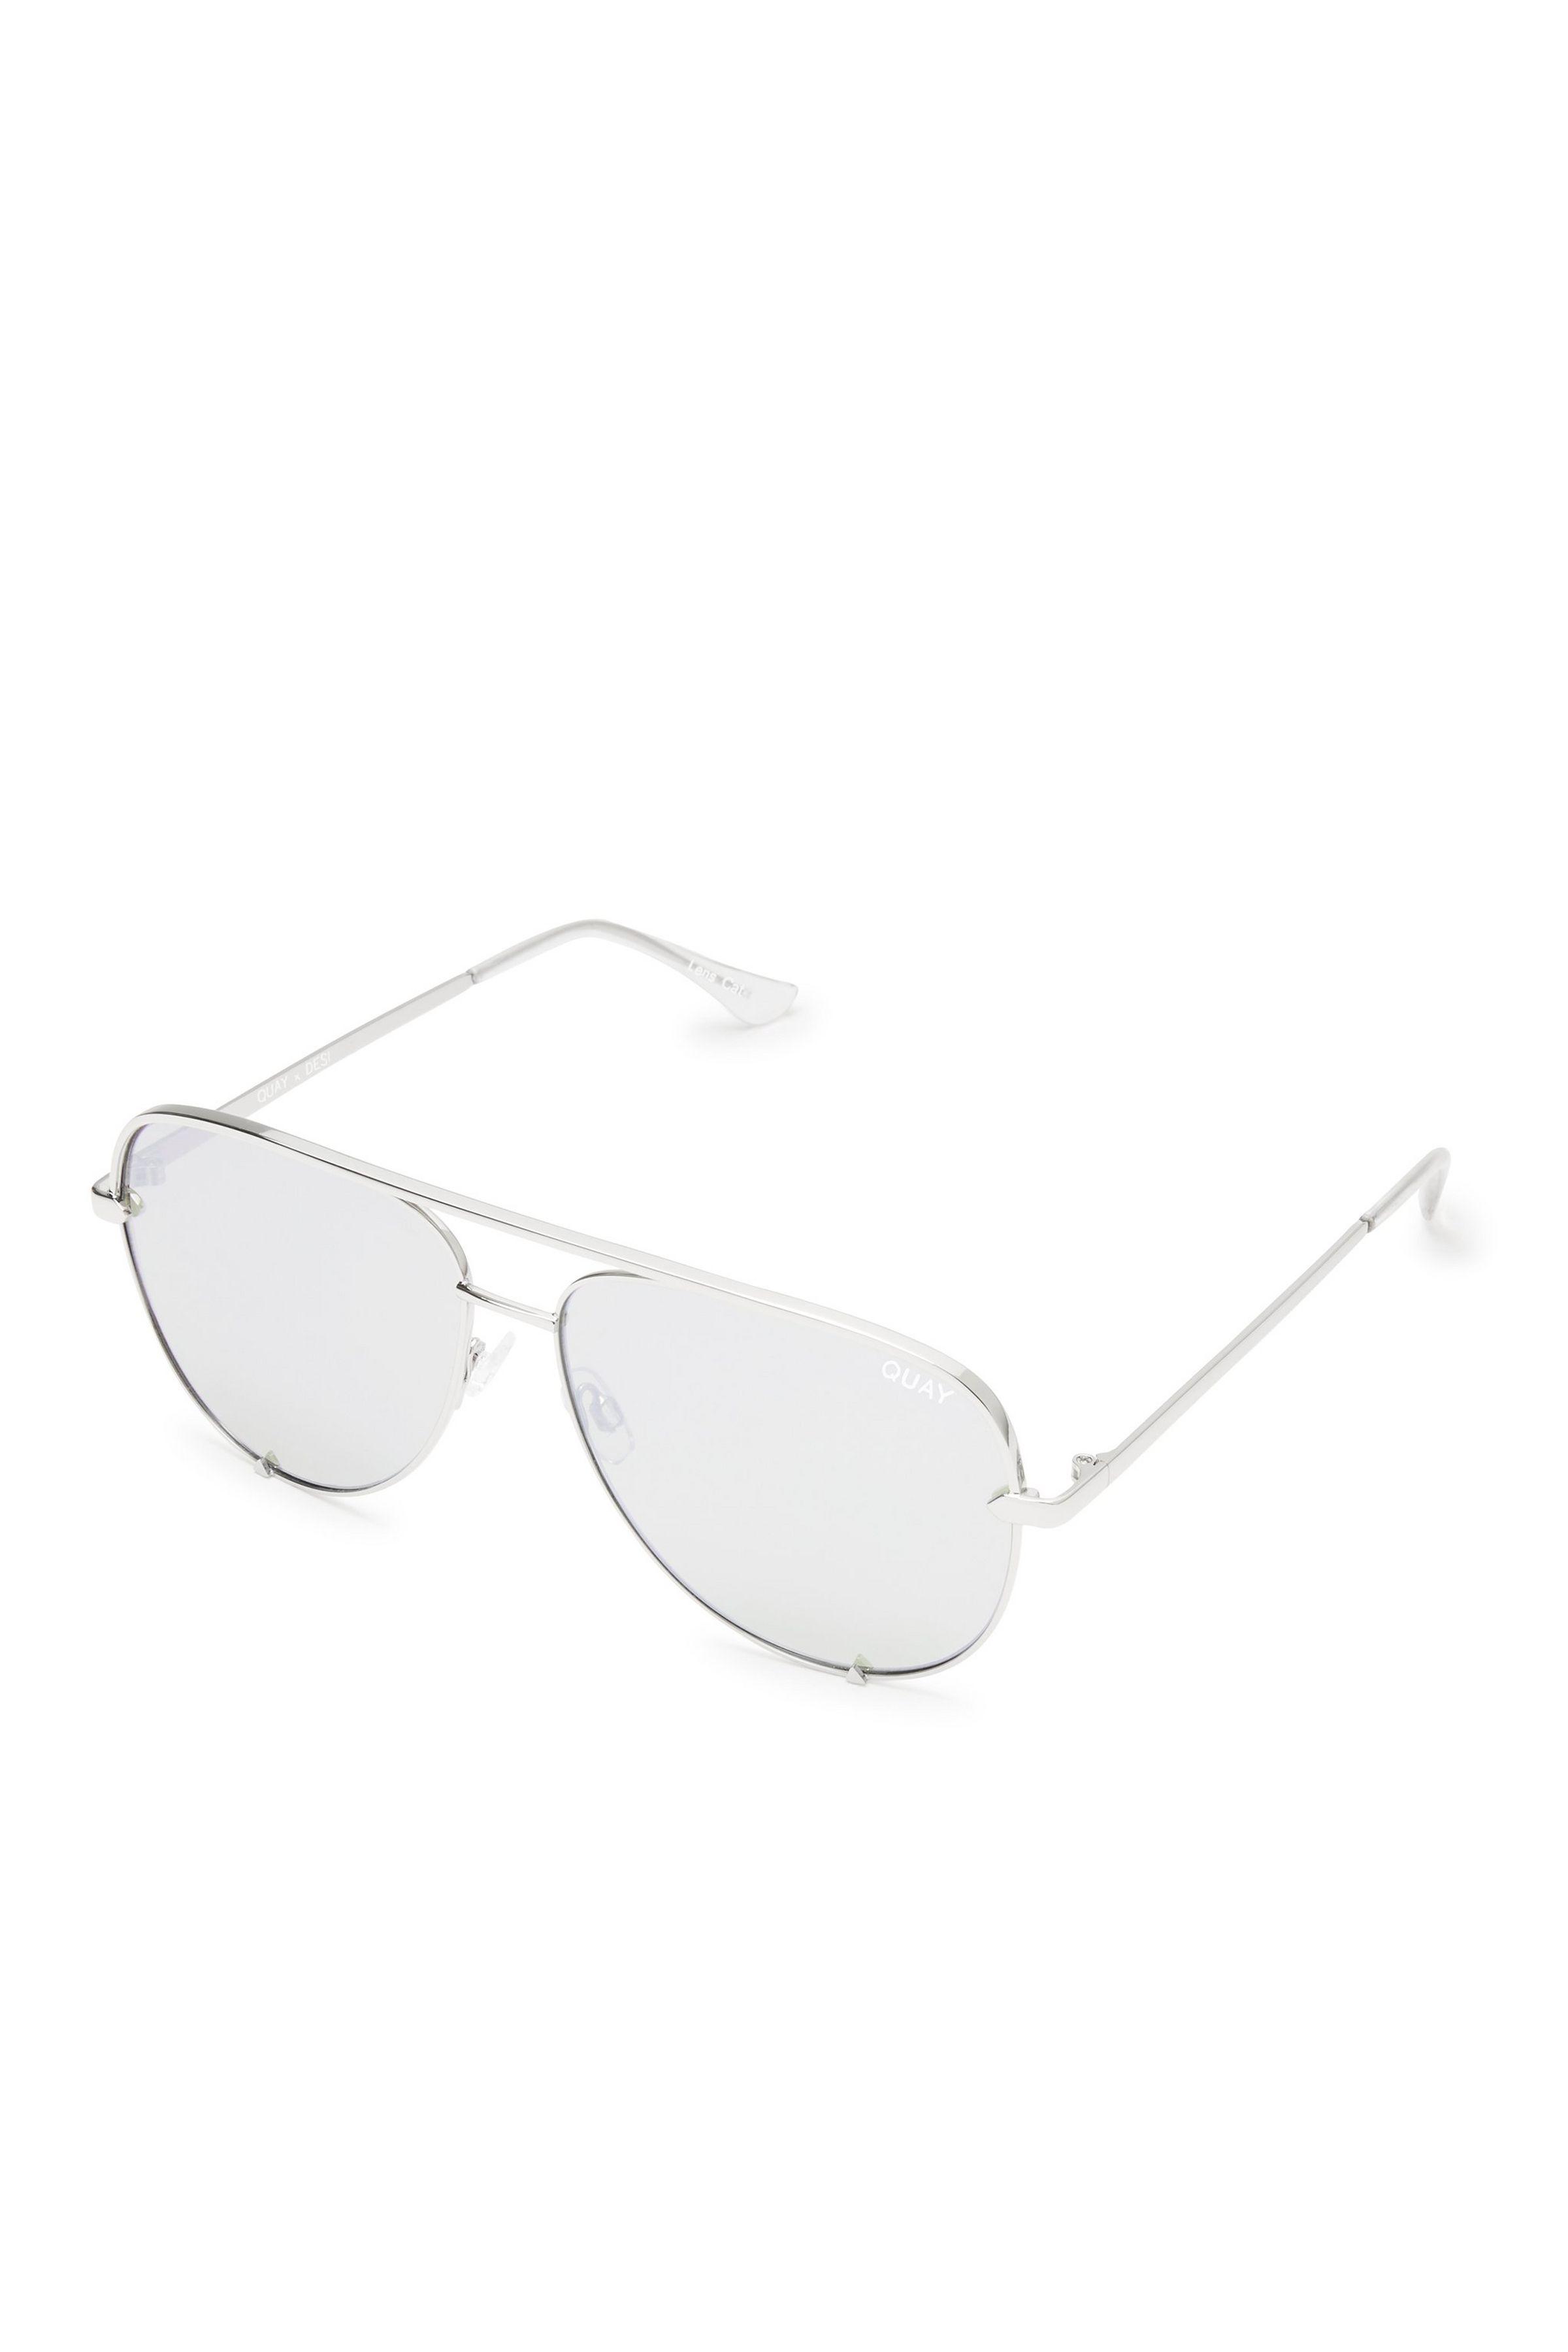 660a134cca19 High Key Sunglasses by Quay Australia in 2019